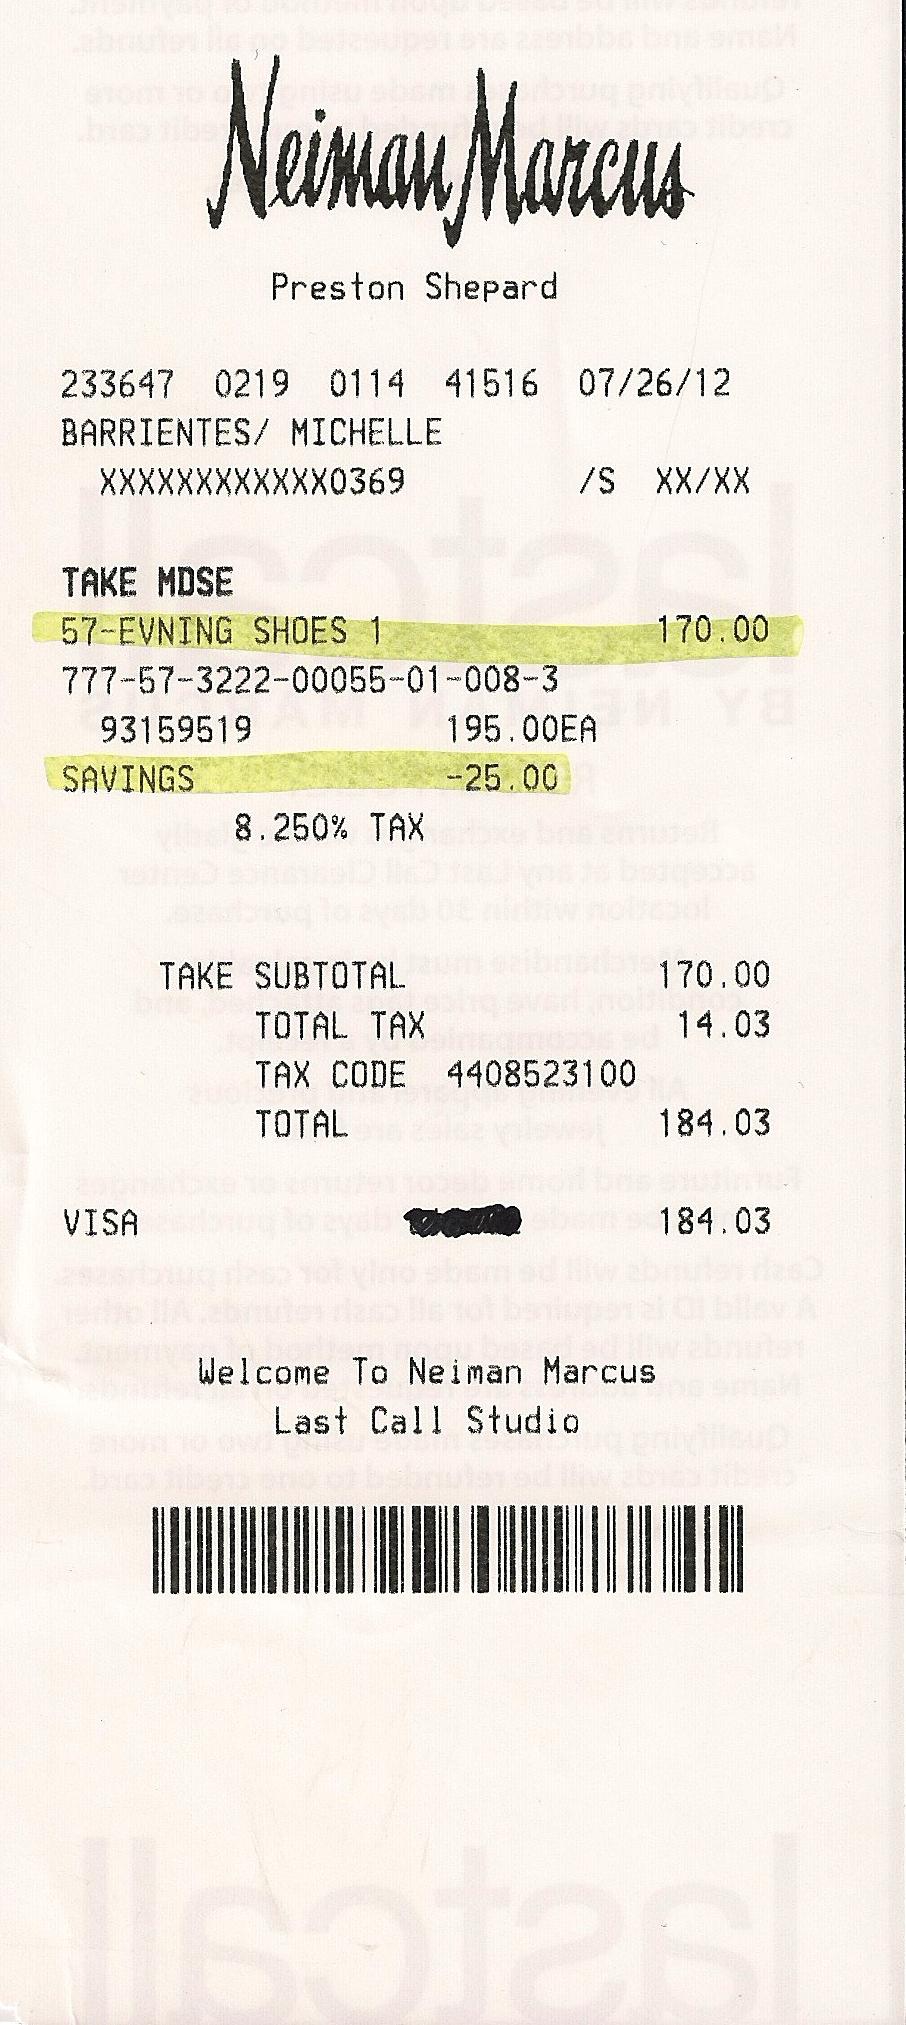 Neiman marcus credit card - Neiman Marcus Receipt